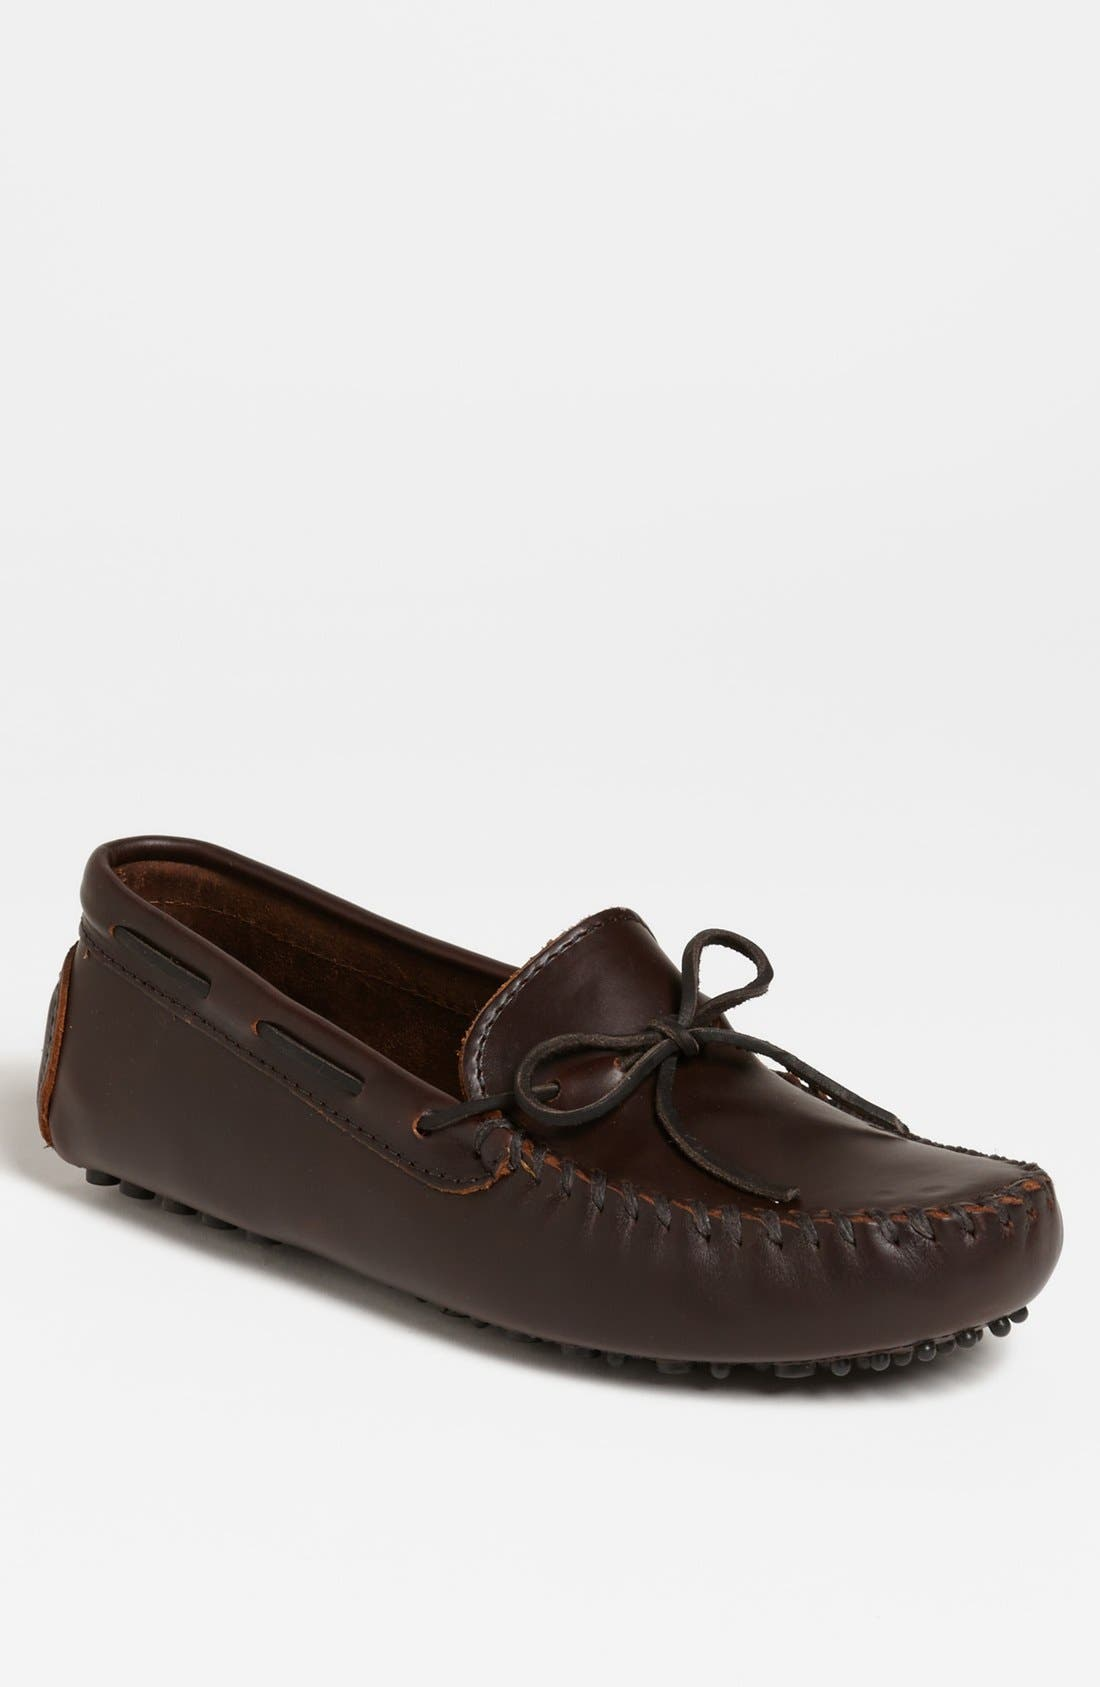 Main Image - Minnetonka Leather Driving Shoe